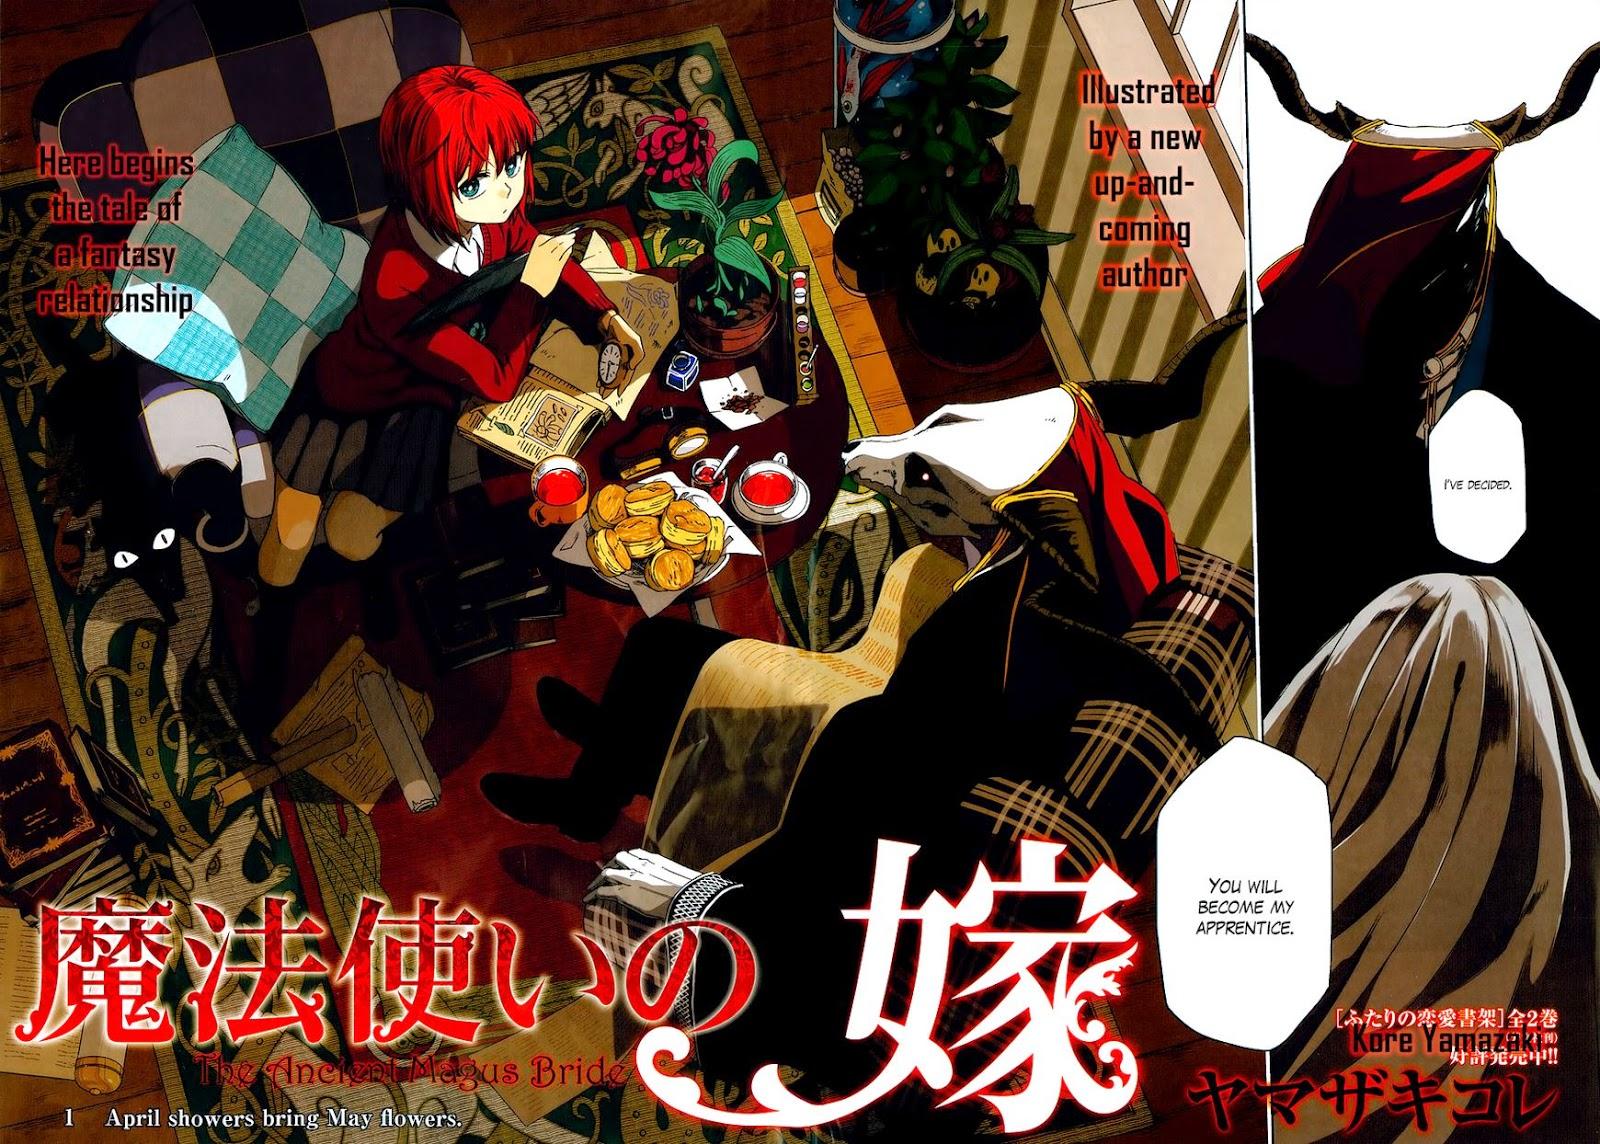 Kết quả hình ảnh cho Mahoutsukai no Yome (The Ancient Magus' Bride)